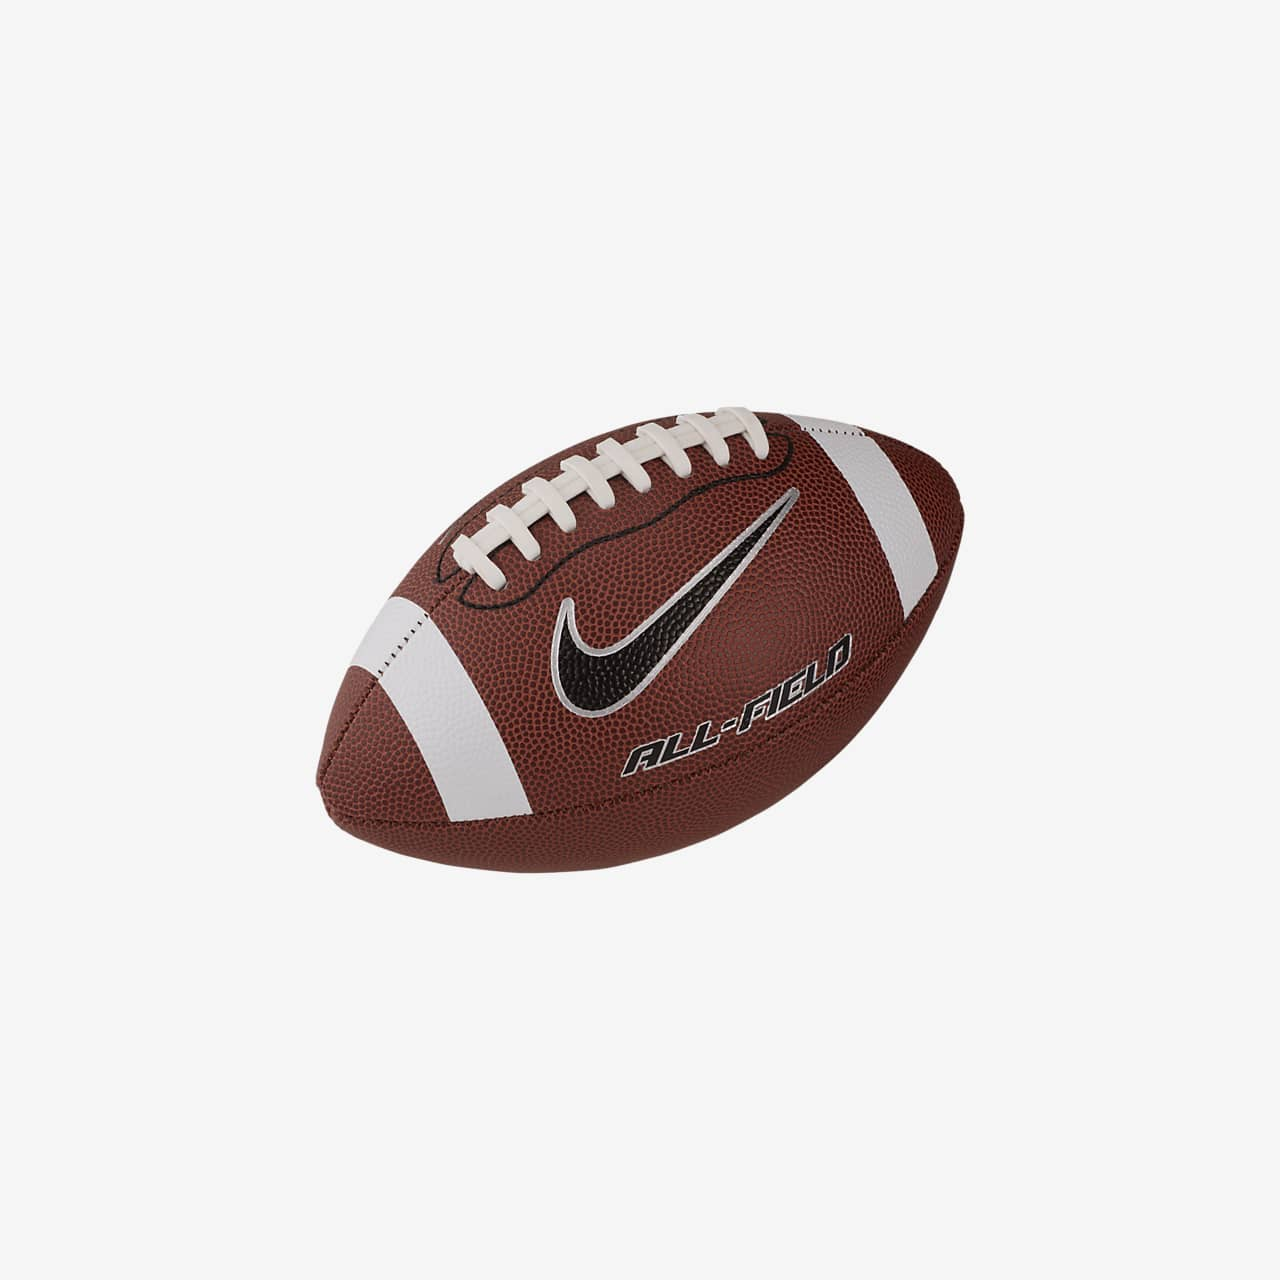 Ropa Dar a luz Persona australiana  Balón de fútbol americano Nike All-Field 3.0. Nike.com